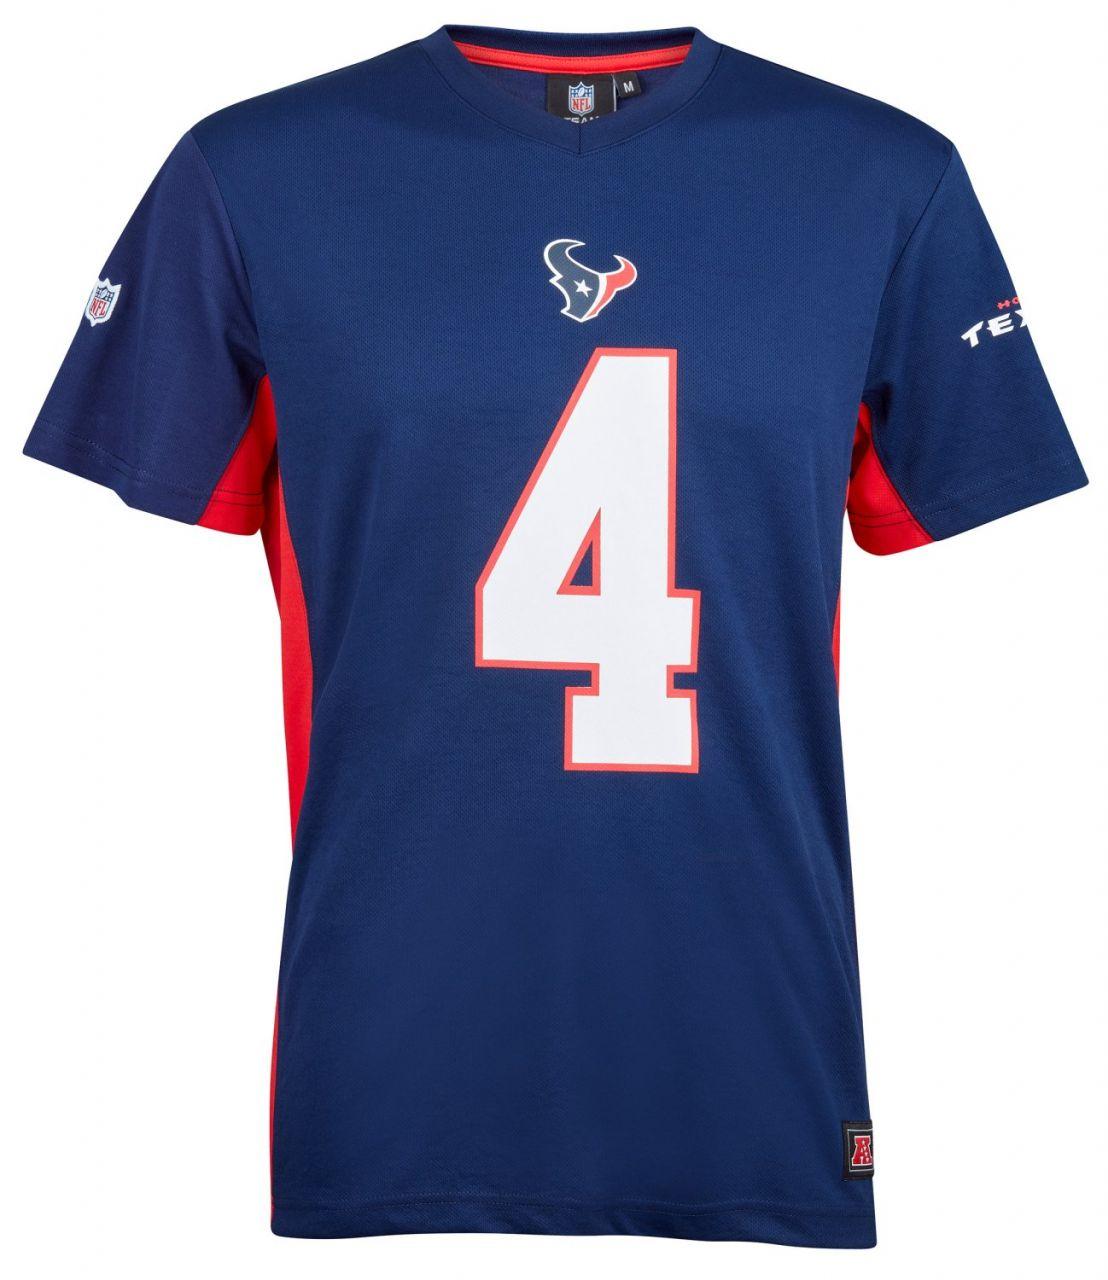 amfoo - NFL Polymesh Jersey Shirt - Houston Texans #4 Watson